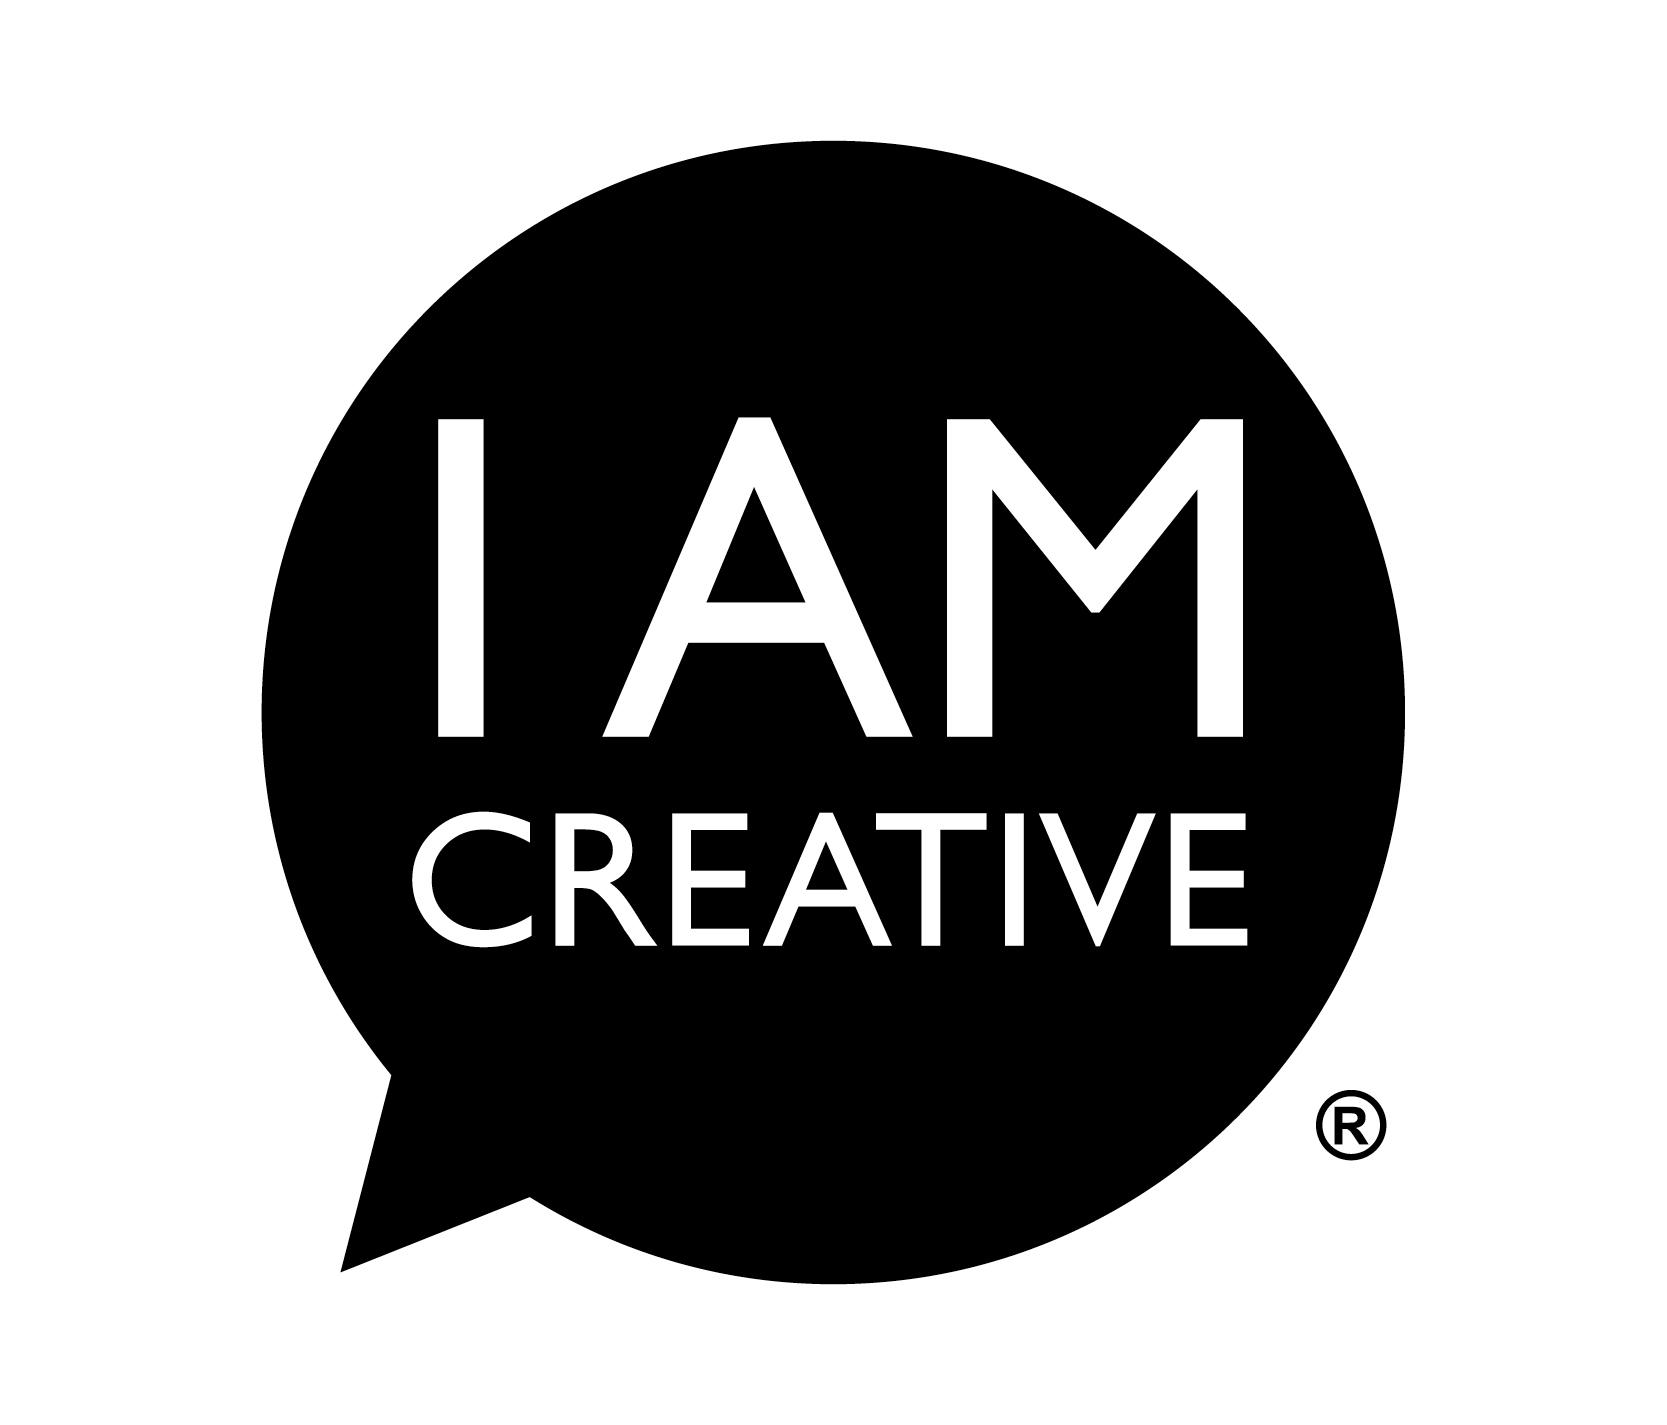 I AM CREATIVE Gewinnspiel